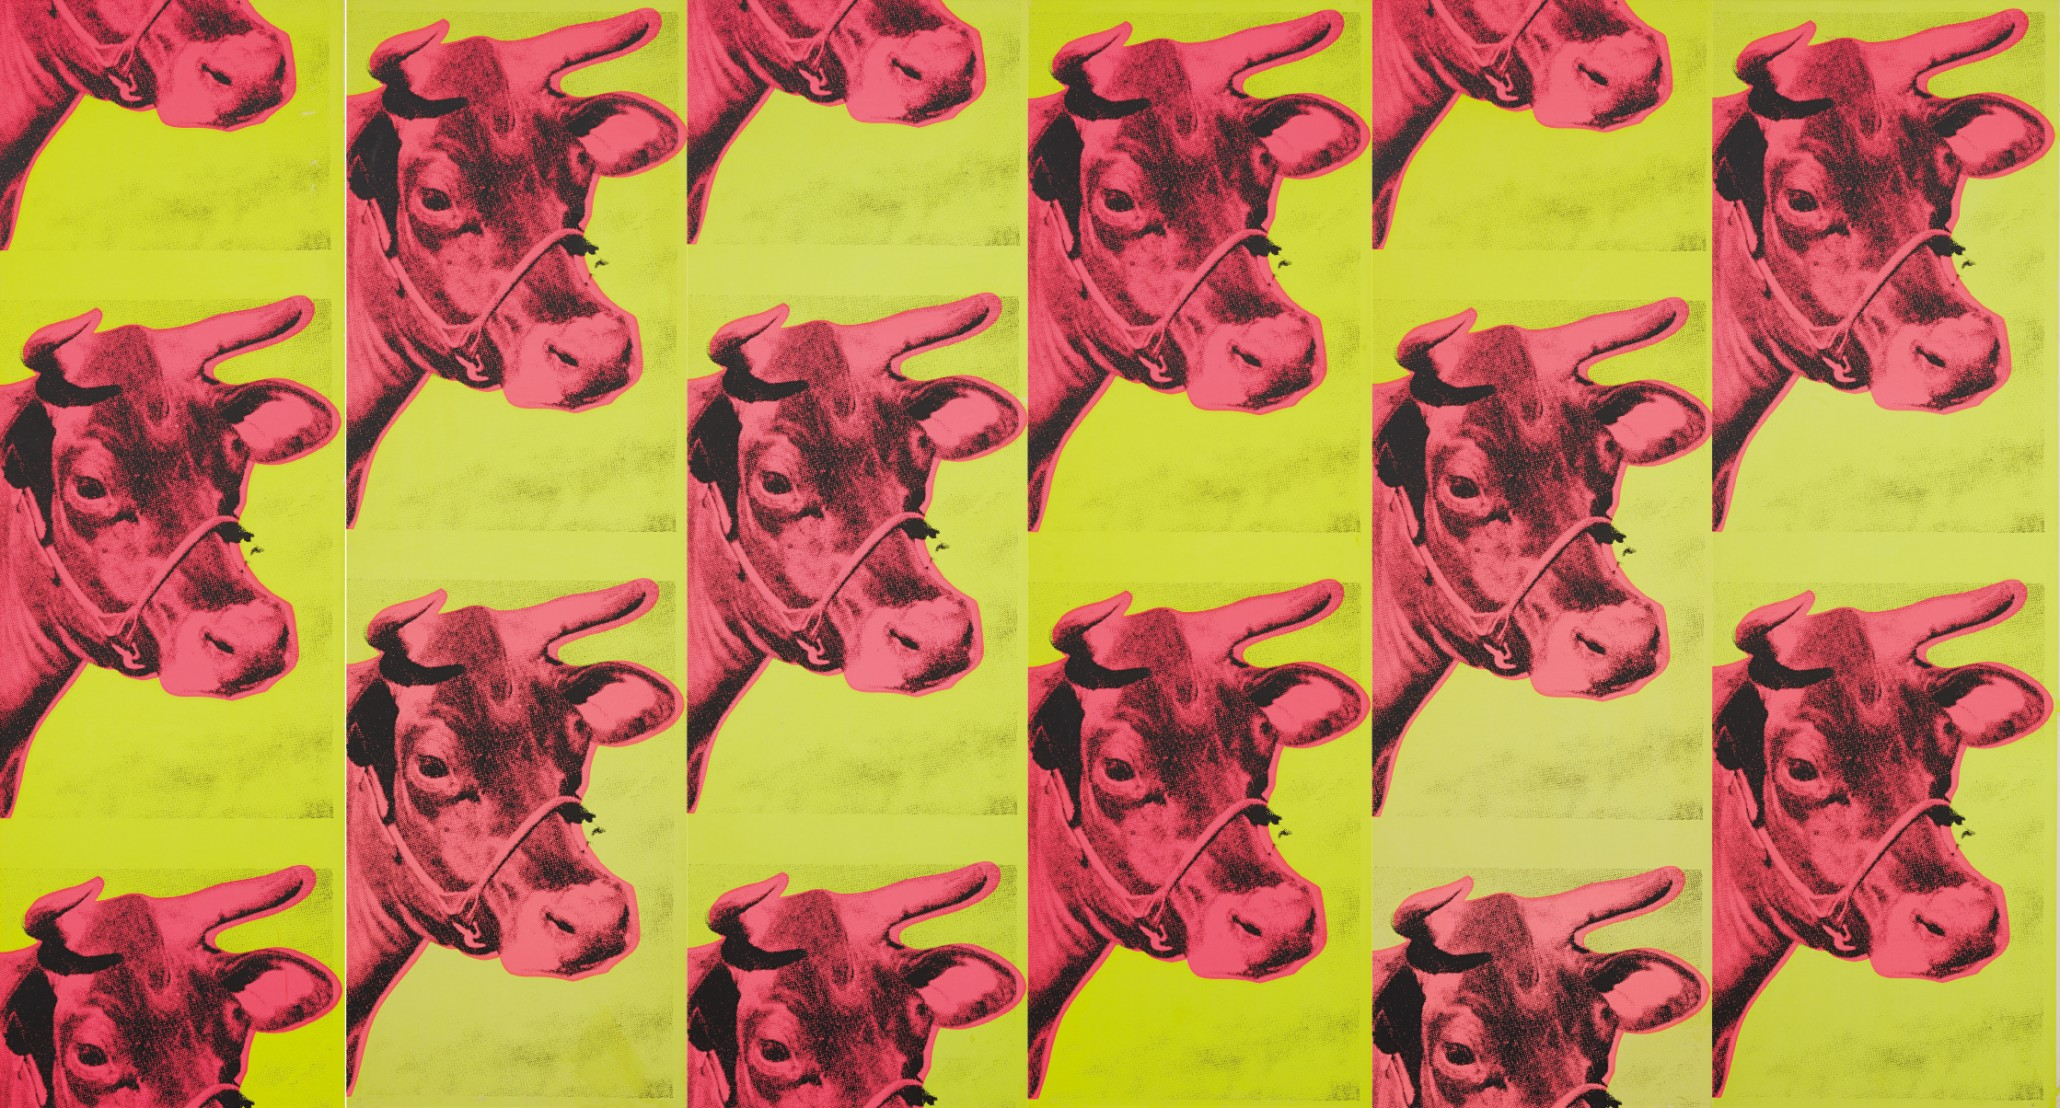 Andy Warhol Cow Wallpaper Wall panels 1966 Estimate 25000 2060x1108